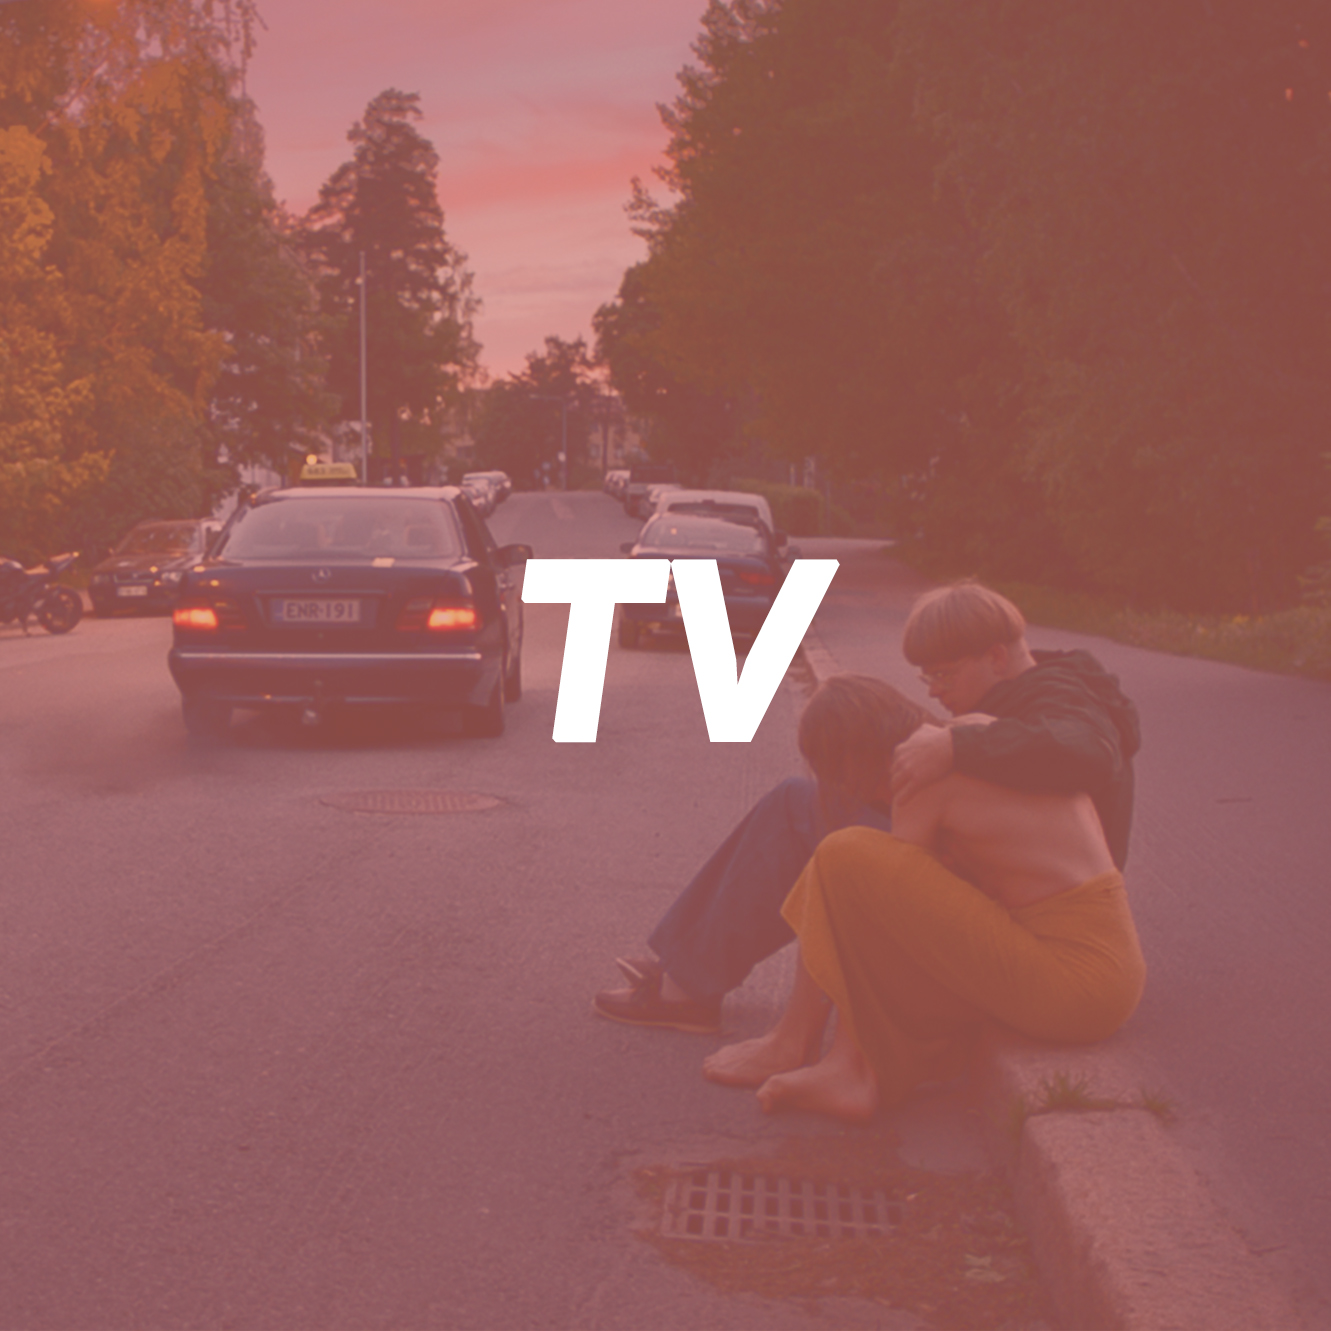 tv_text.jpg